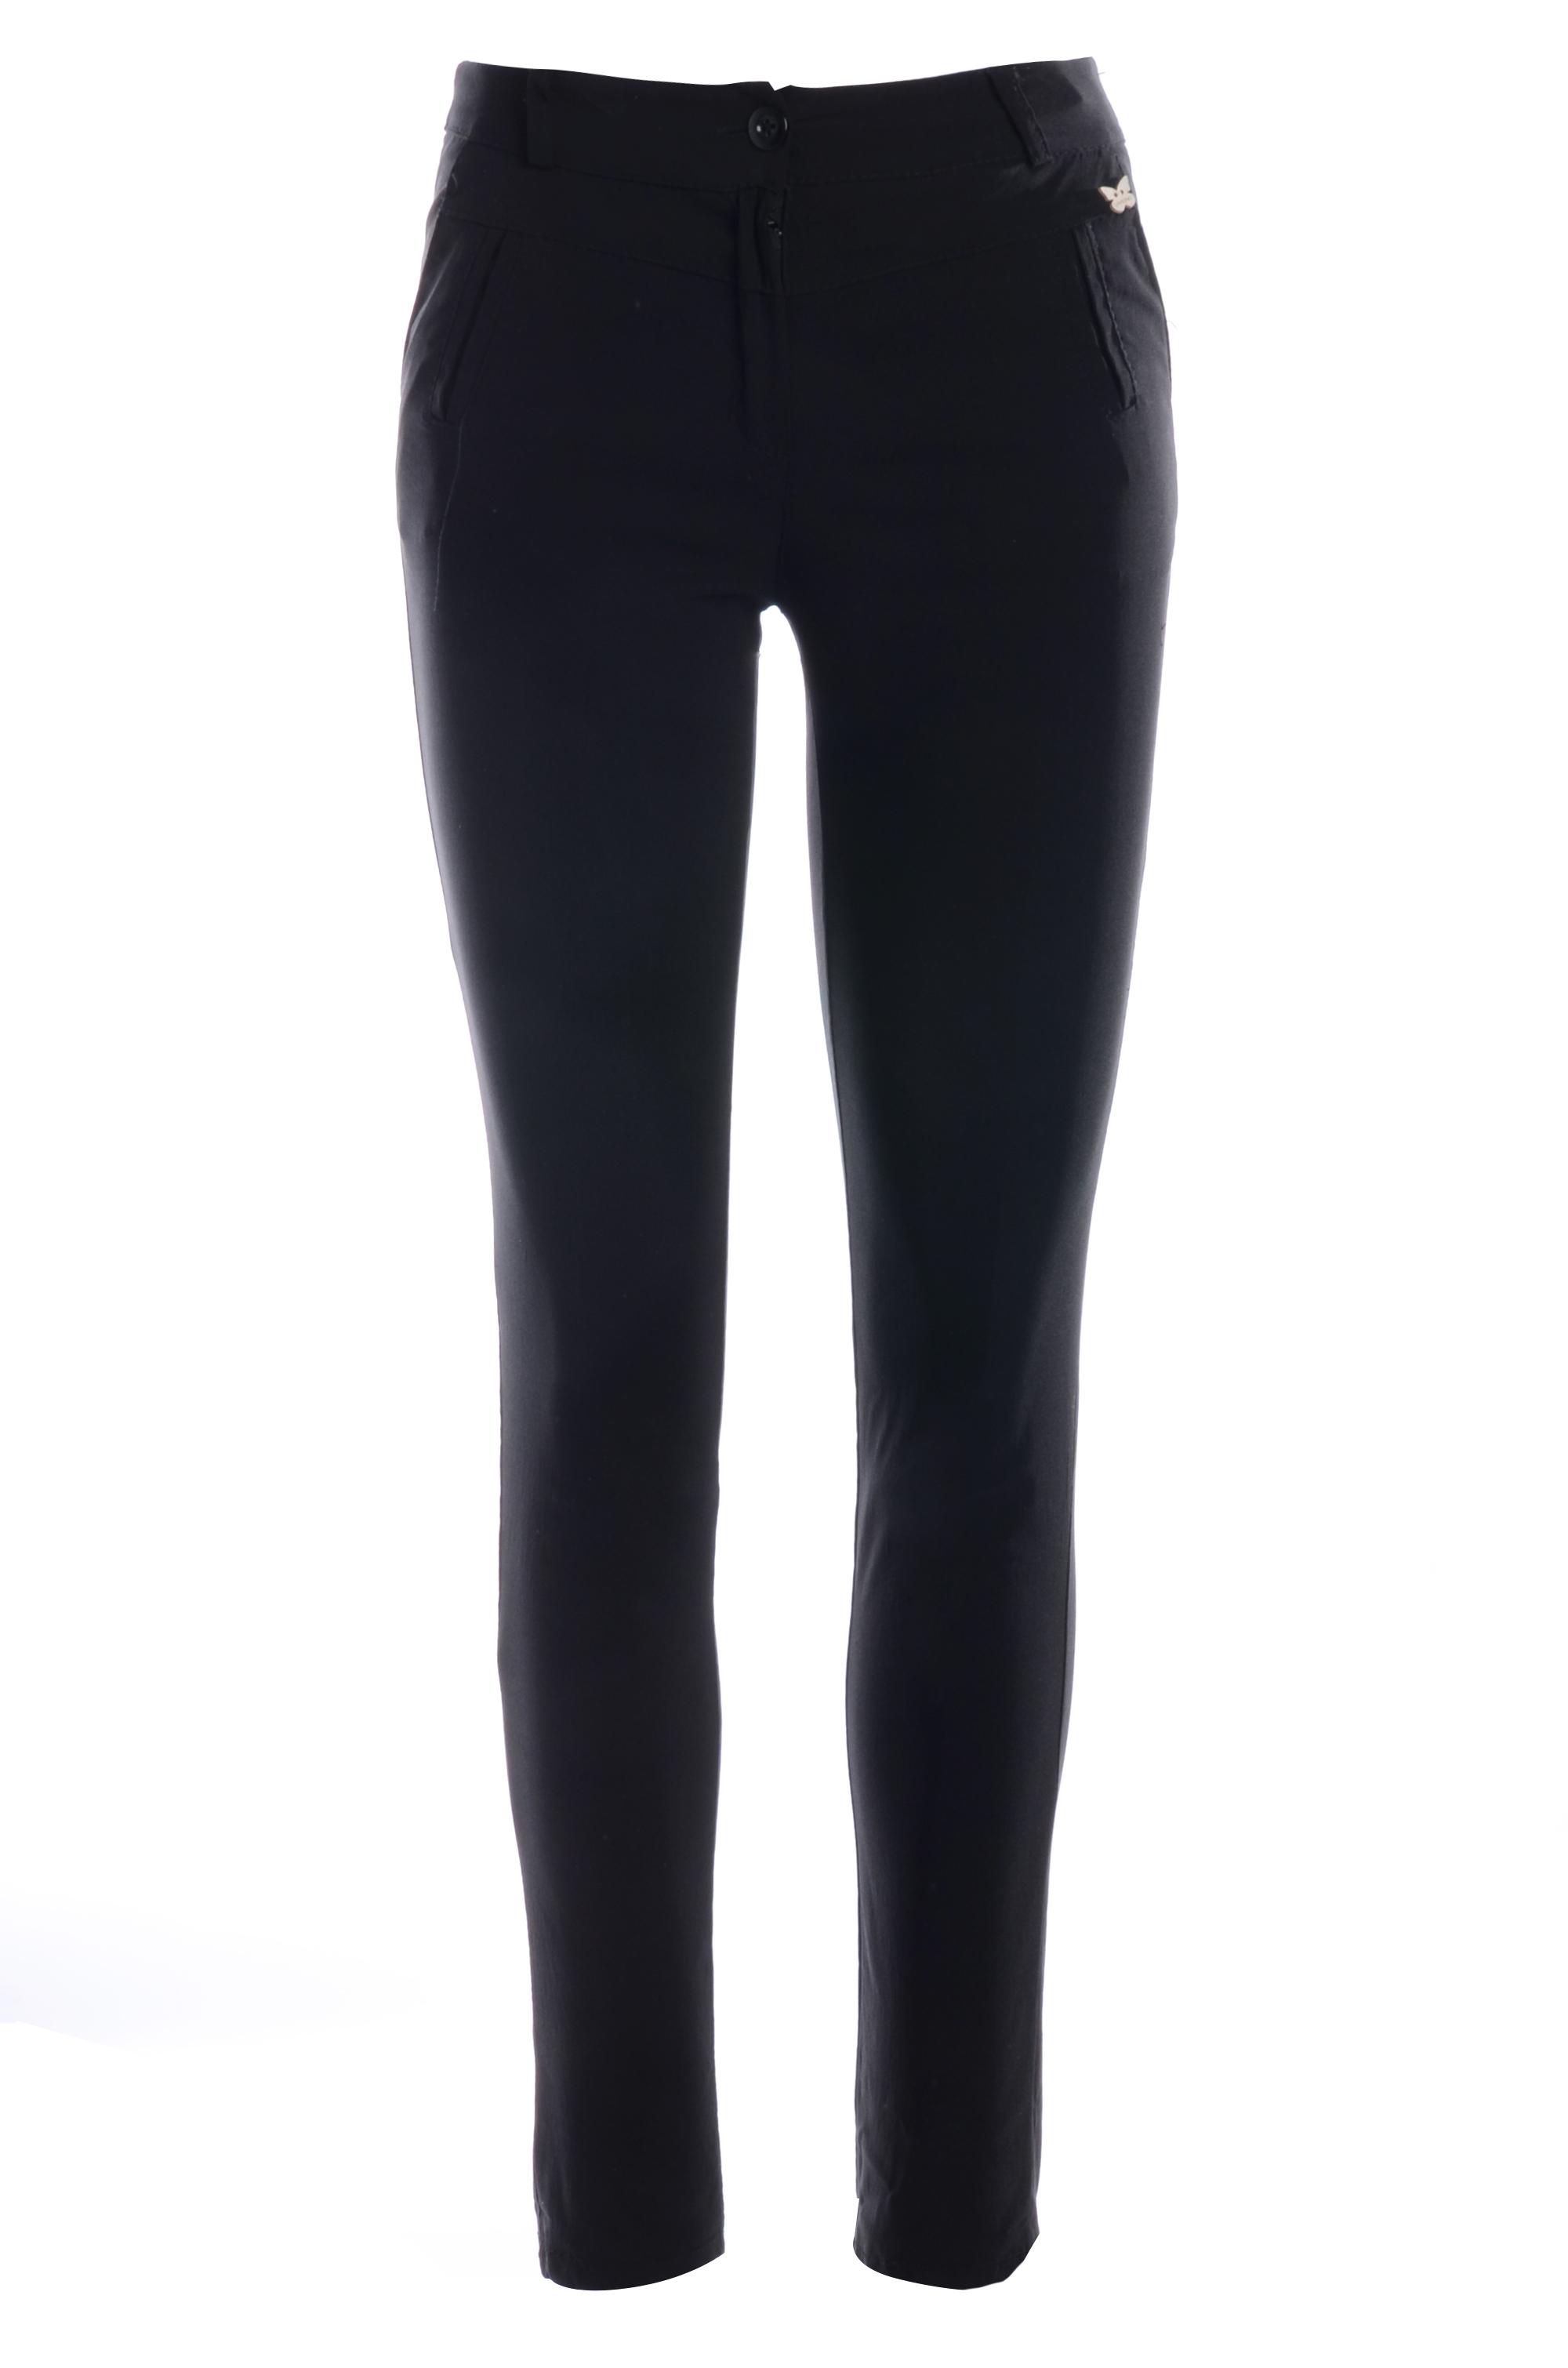 Spodnie - 10-2850 NERO - Unisono